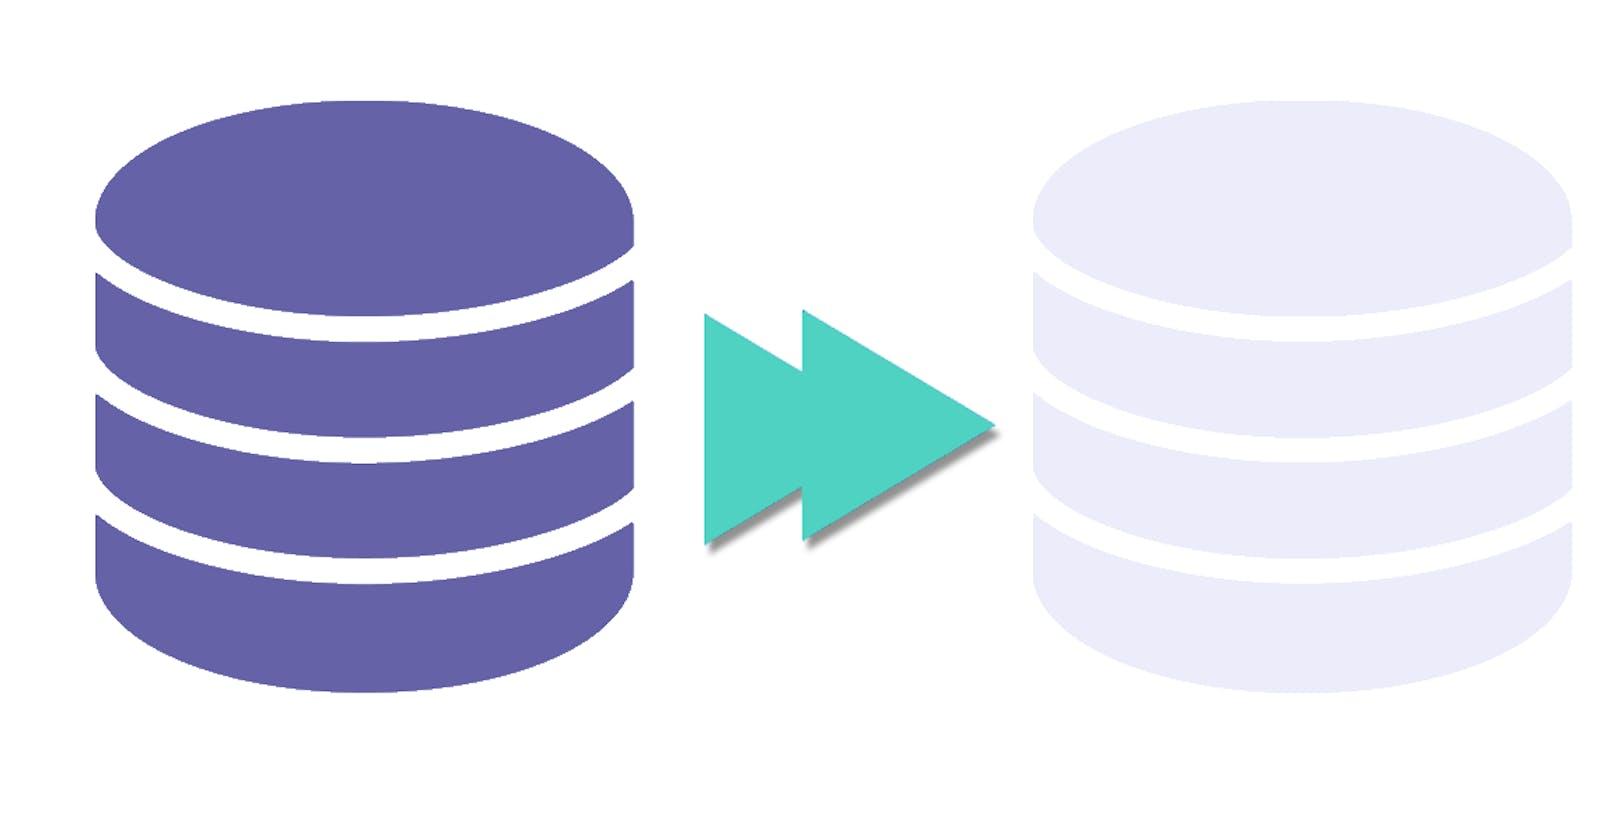 Database Replication: Master-Slave Replication Architecture